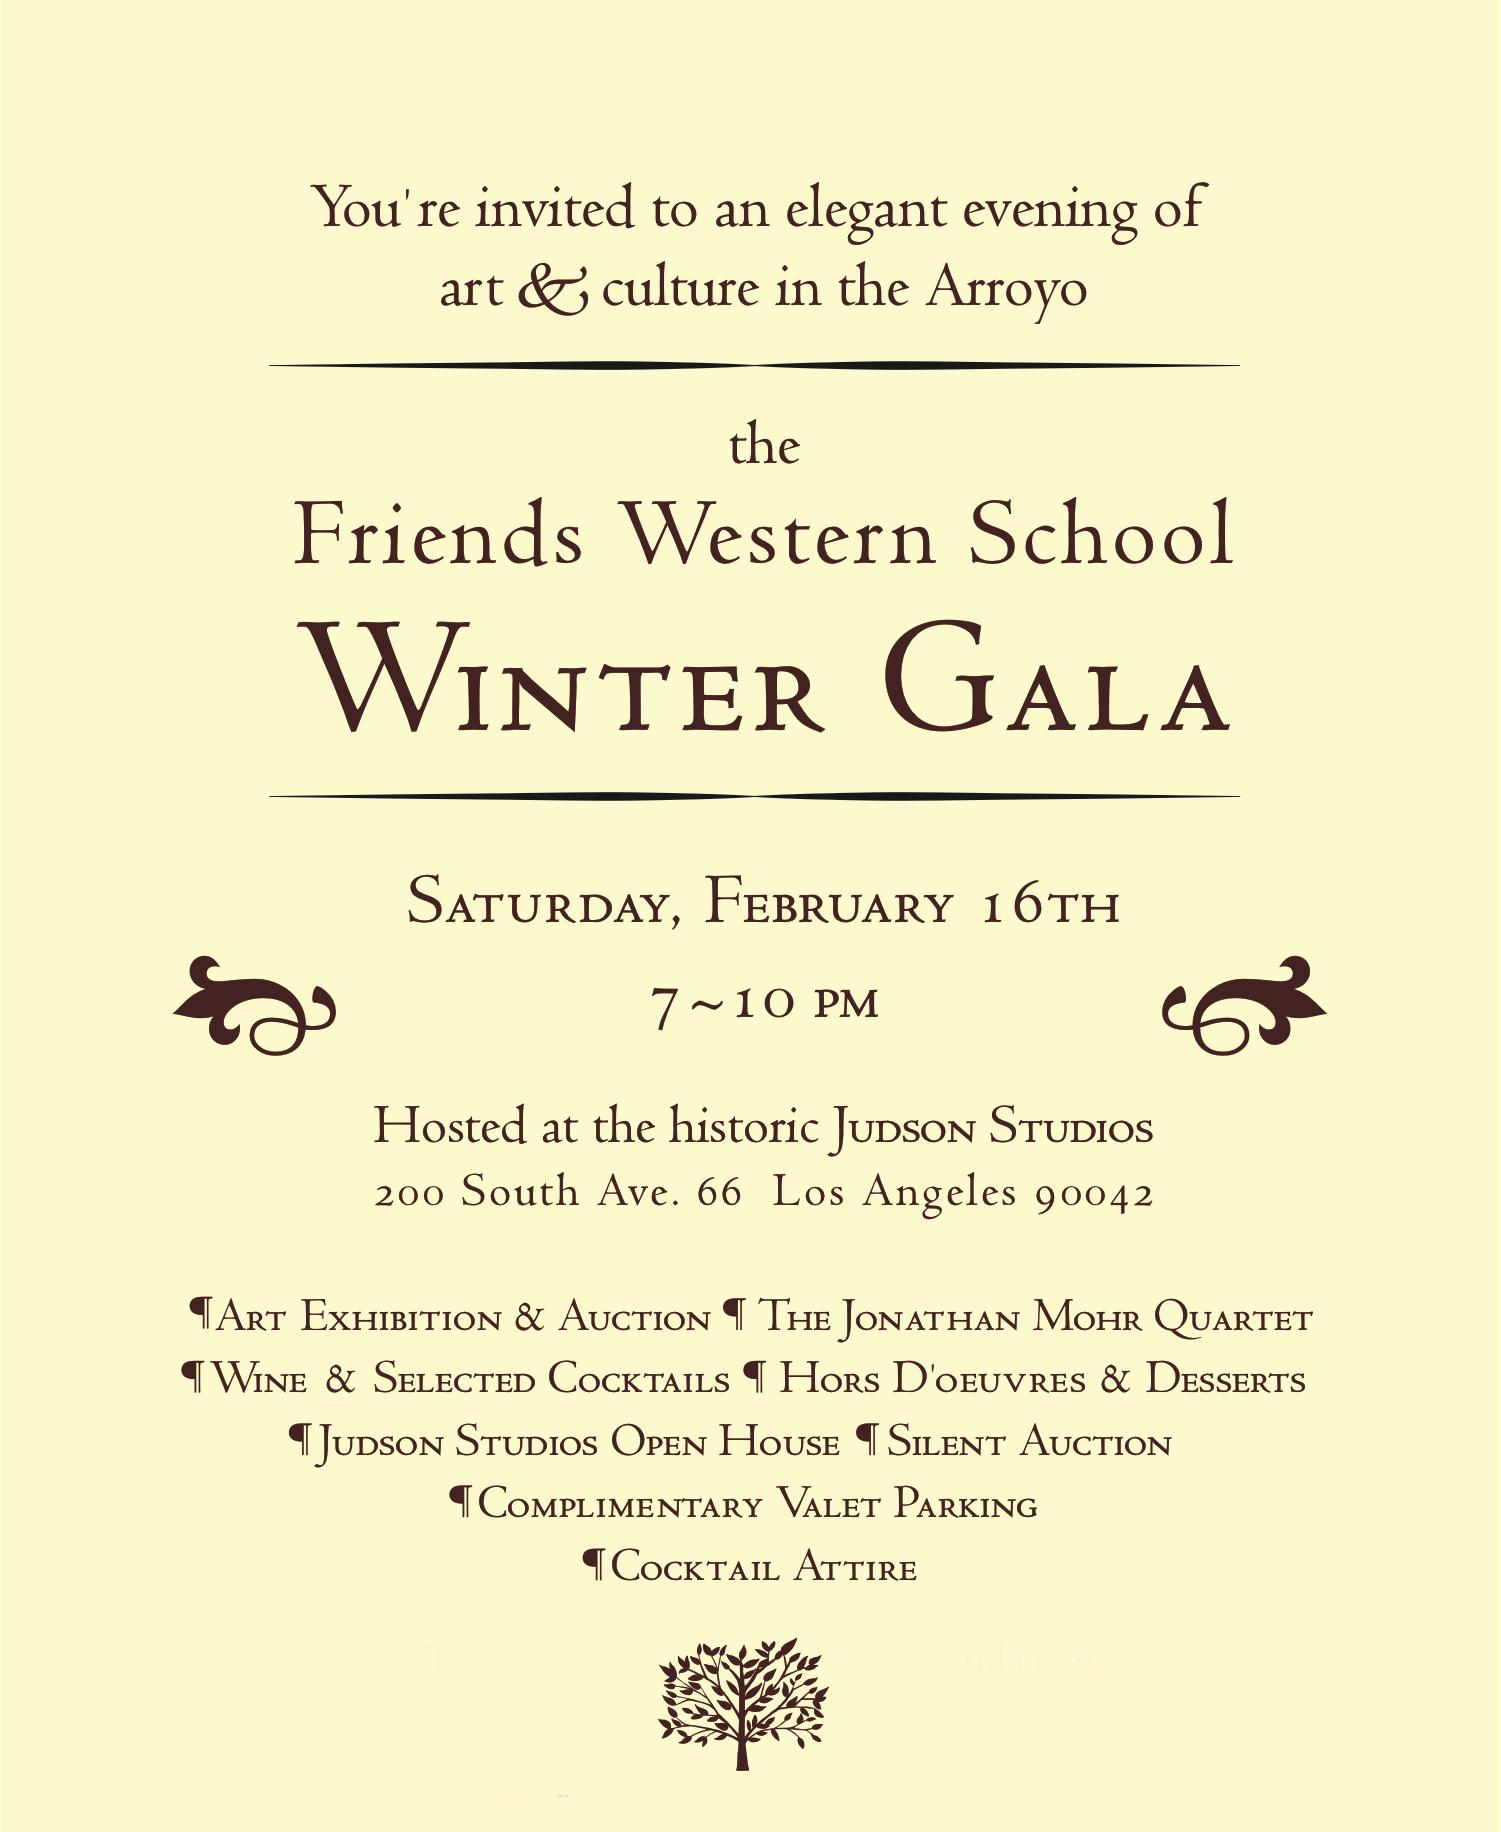 Friends Western School 2013 Winter Gala at The Judson Studios